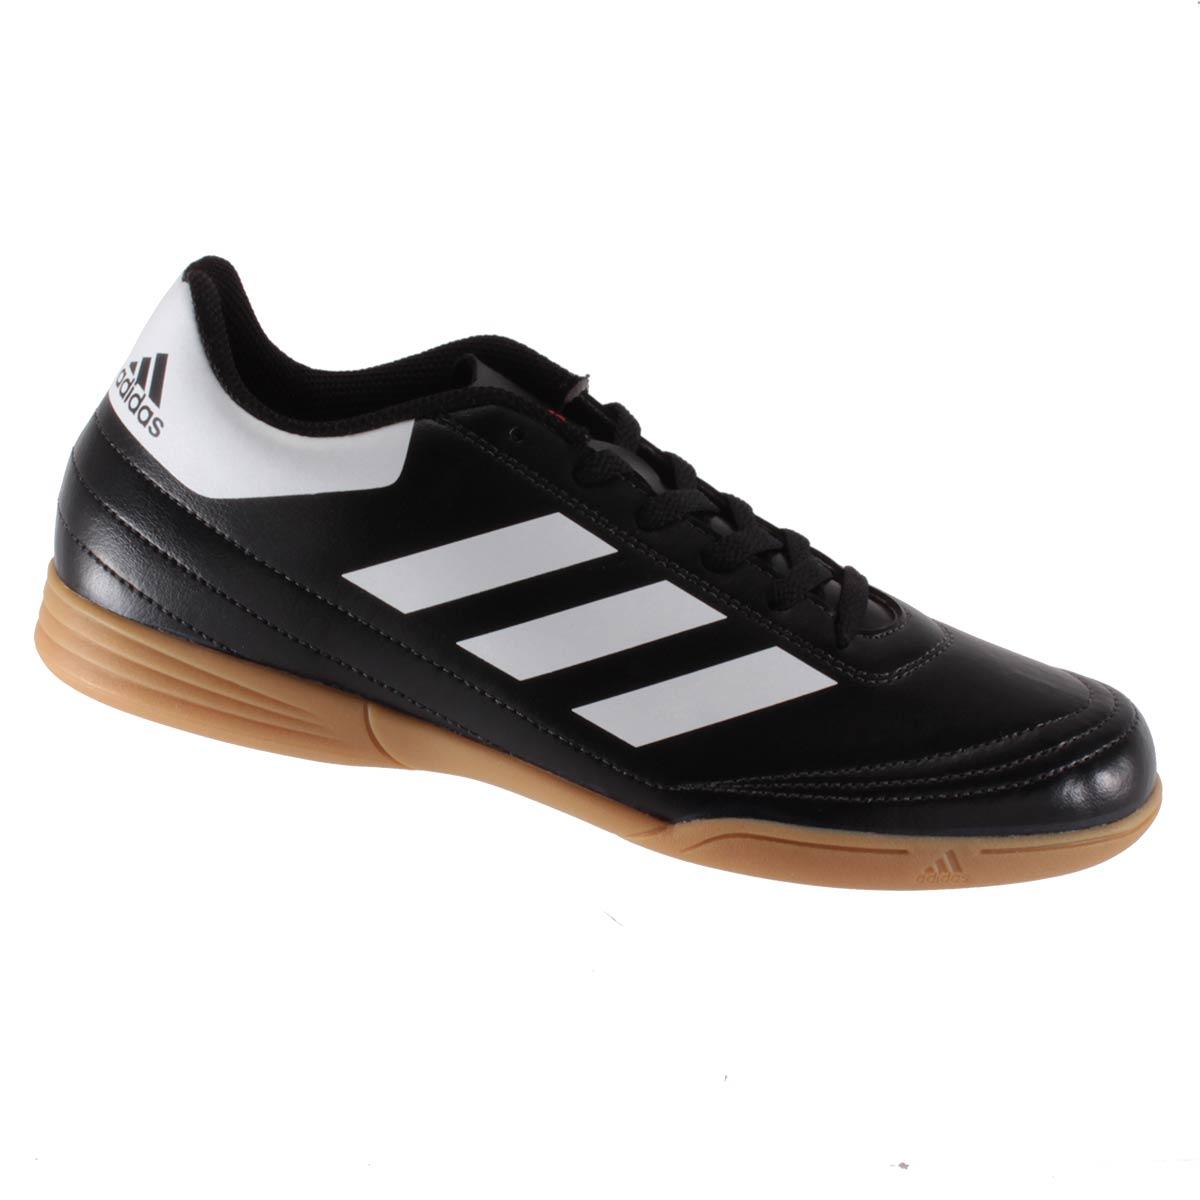 Chuteira Adidas Goletto 6 IN Futsal Masculino Futebol Salão Tênis AQ4289